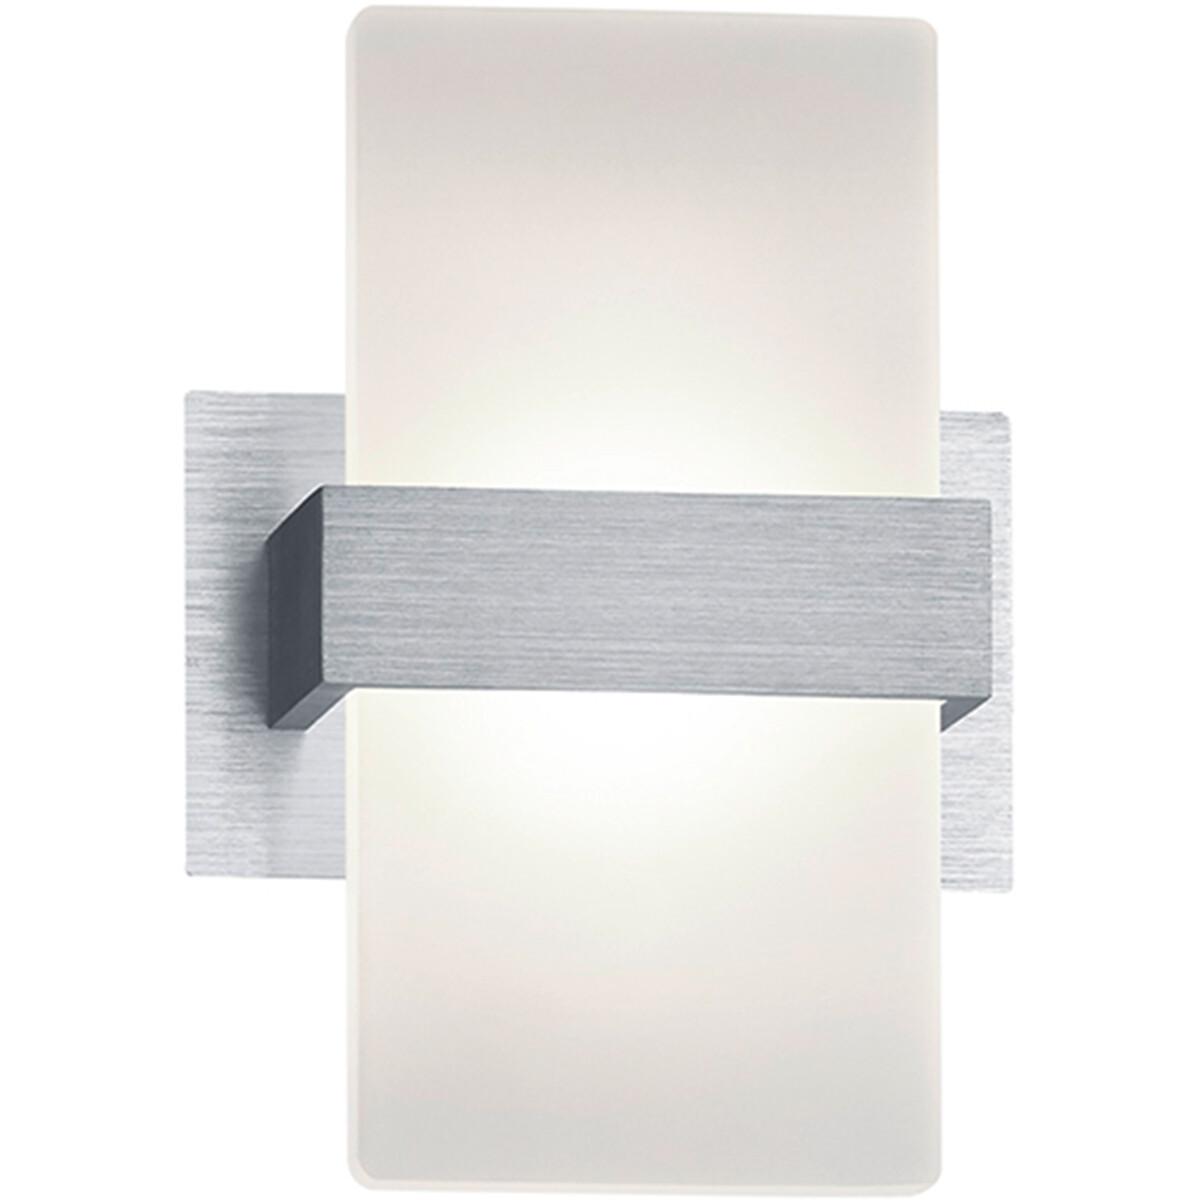 OSRAM - LED Wandspot - Trion Plankton - 4W - Warm Wit 3000K - 1-lichts - Rechthoek - Mat Grijs - Alu